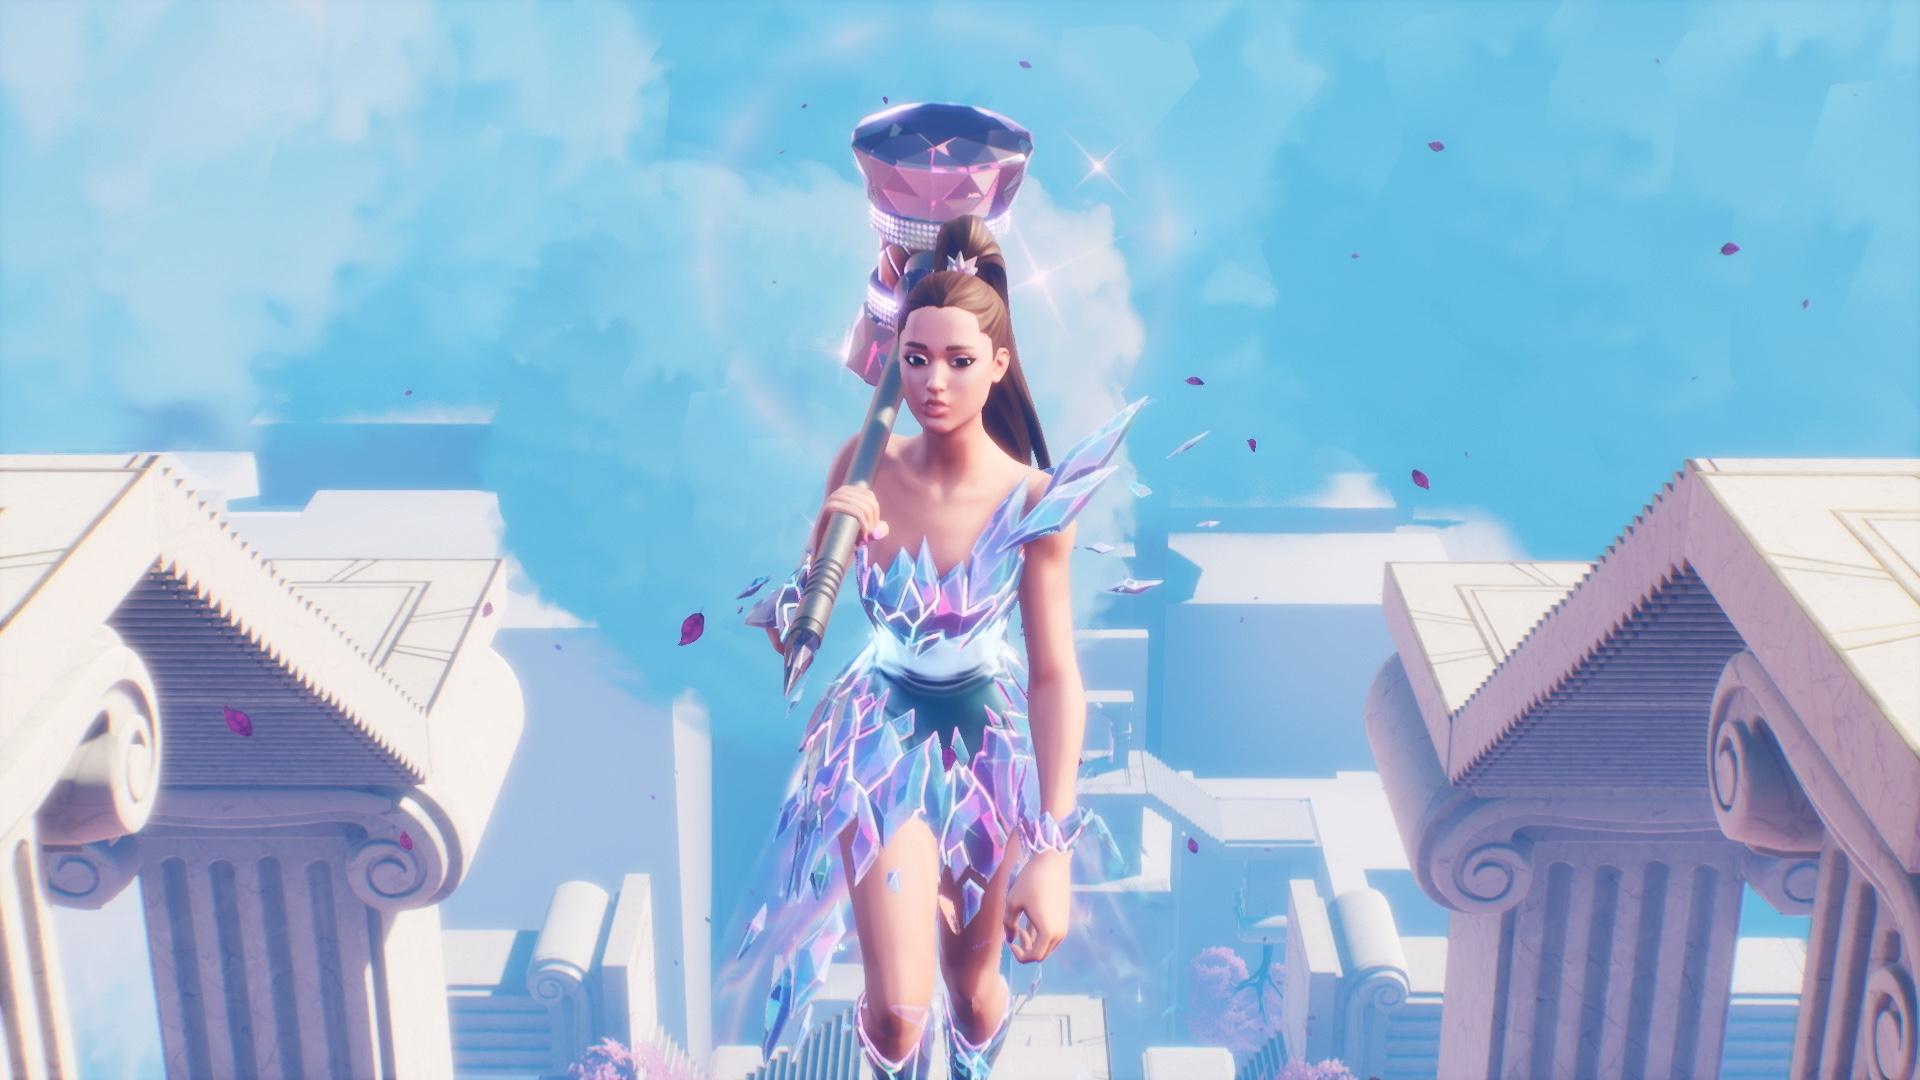 Pop star Ariana Grande held a concert in a video game